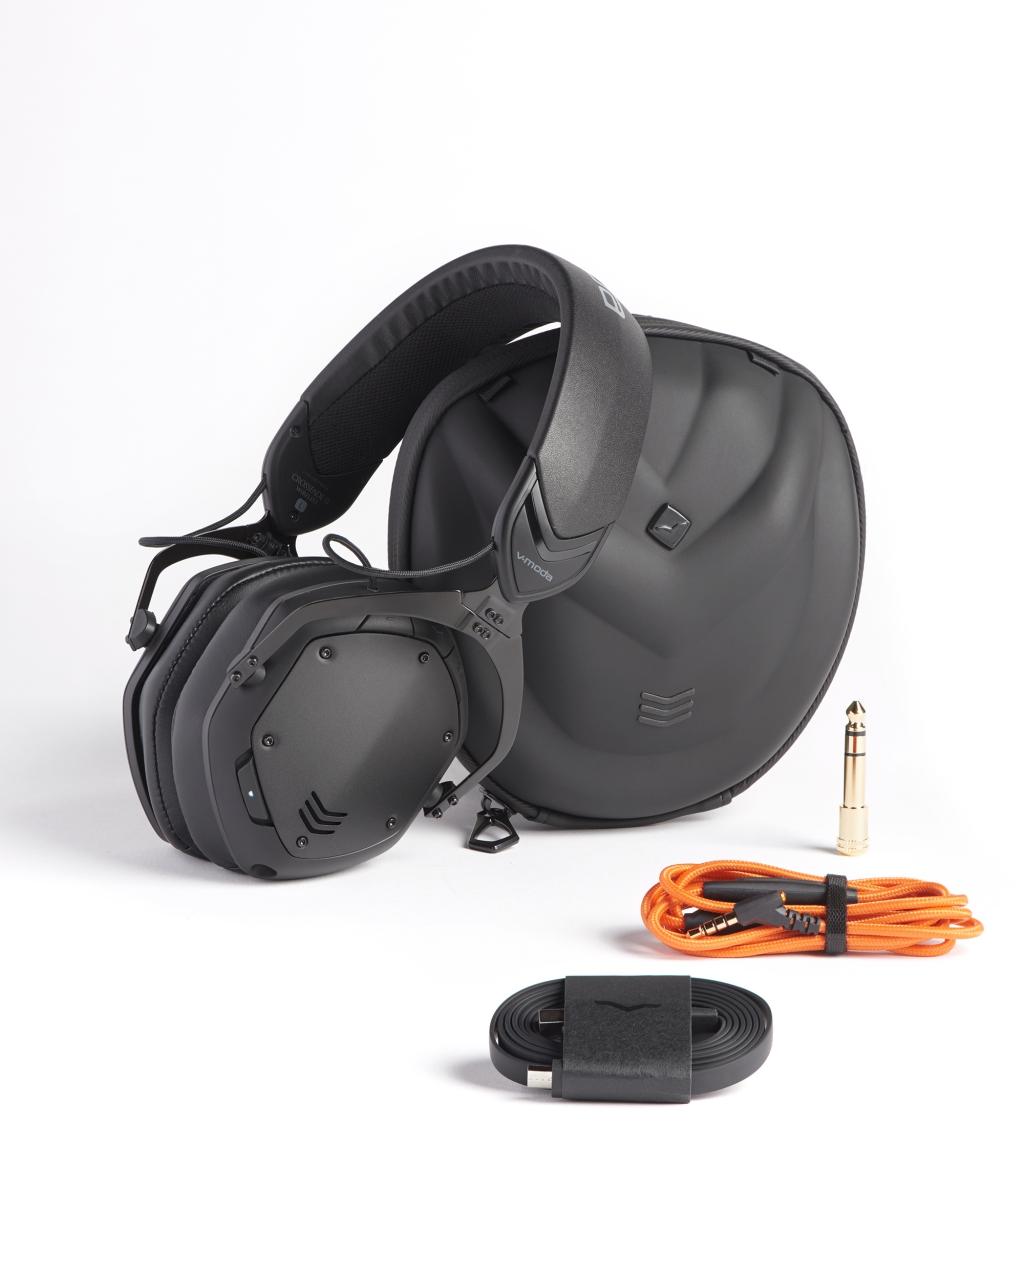 resize_XFBT2_matteblack_accessories